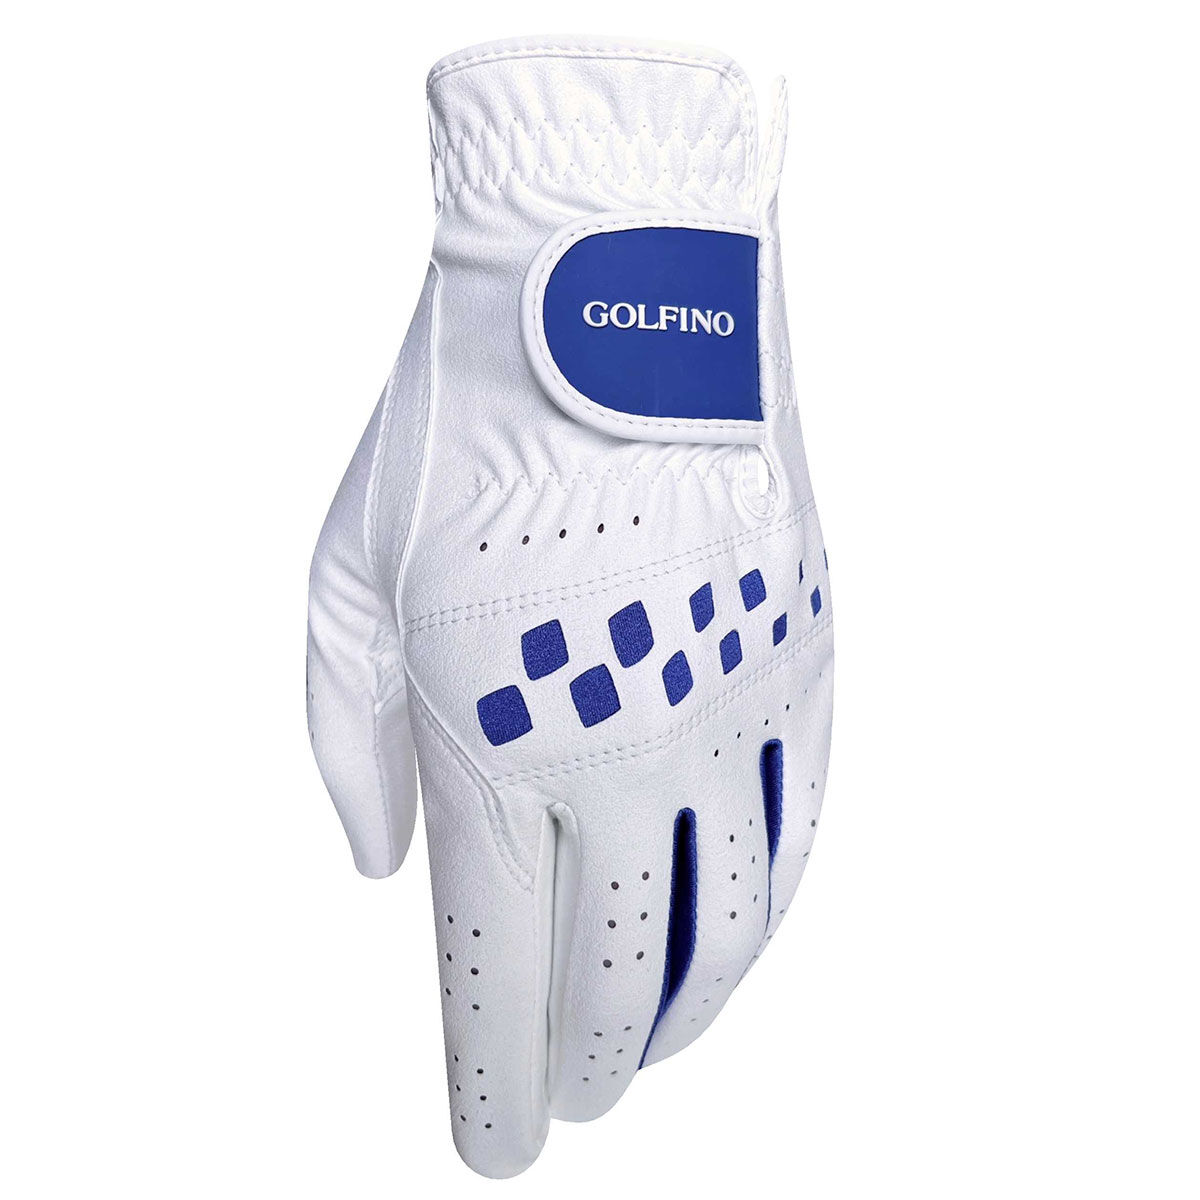 GOLFINO All Weather Hybrid Womens Golf Glove, Female, Left hand, Large, White/navy | American Golf